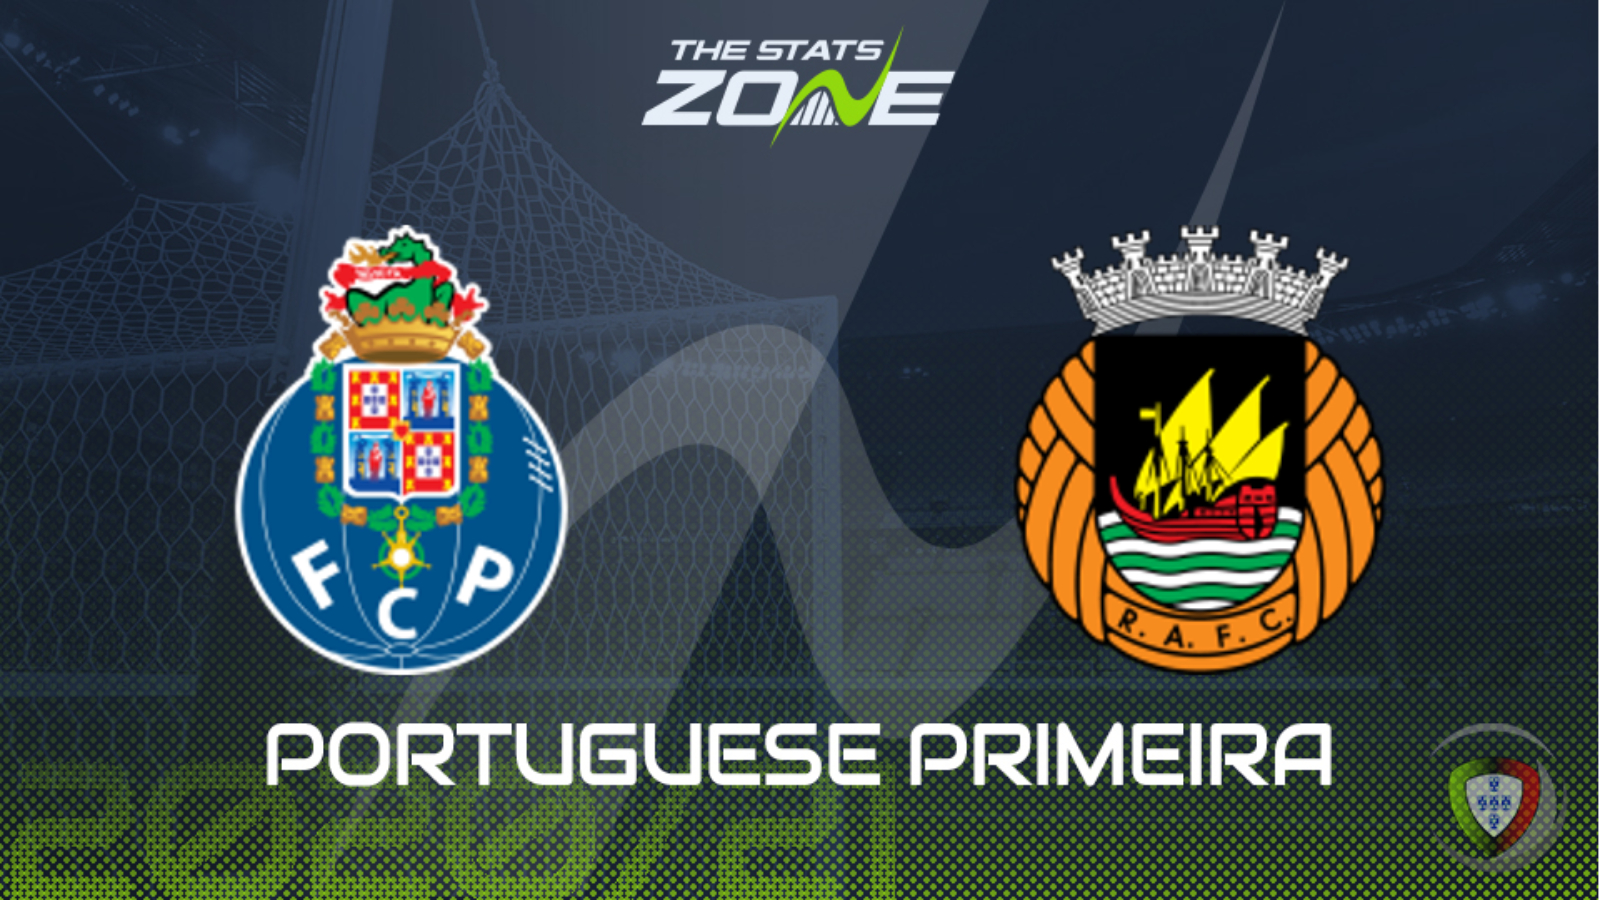 Porto vs rio ave betting preview bettinger west interiors elkridge md obituaries